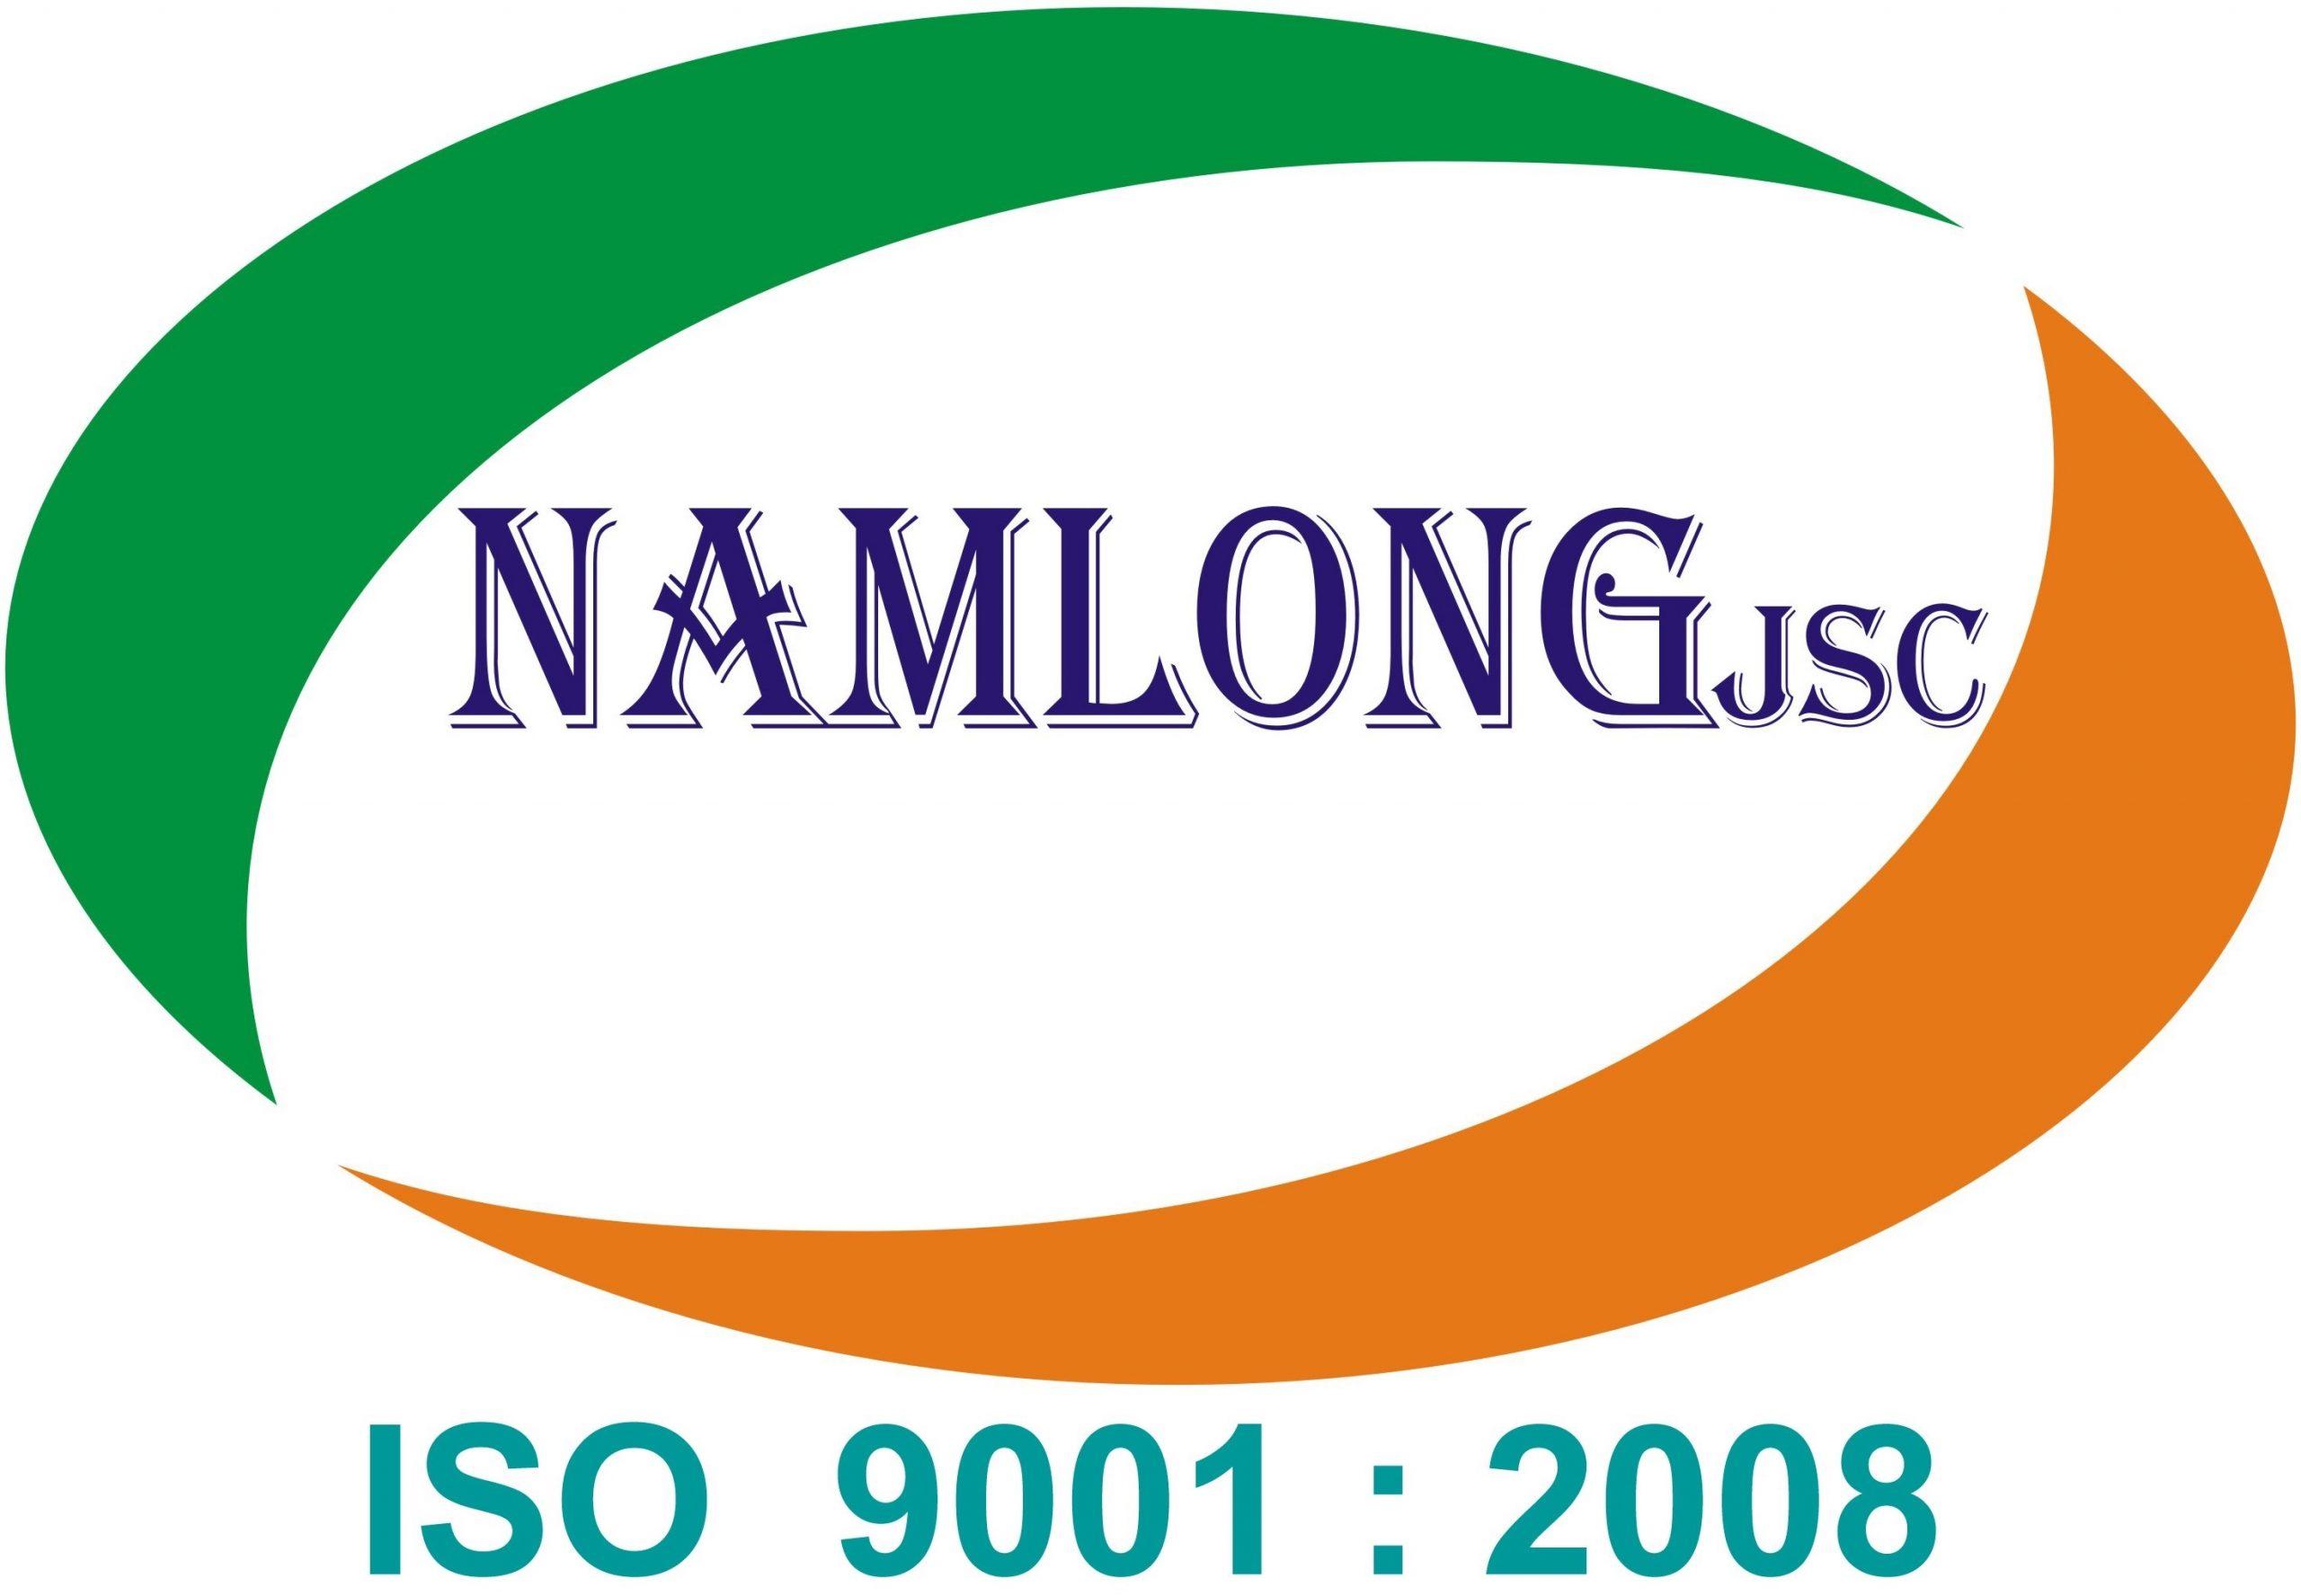 Xích Neo Nam Long